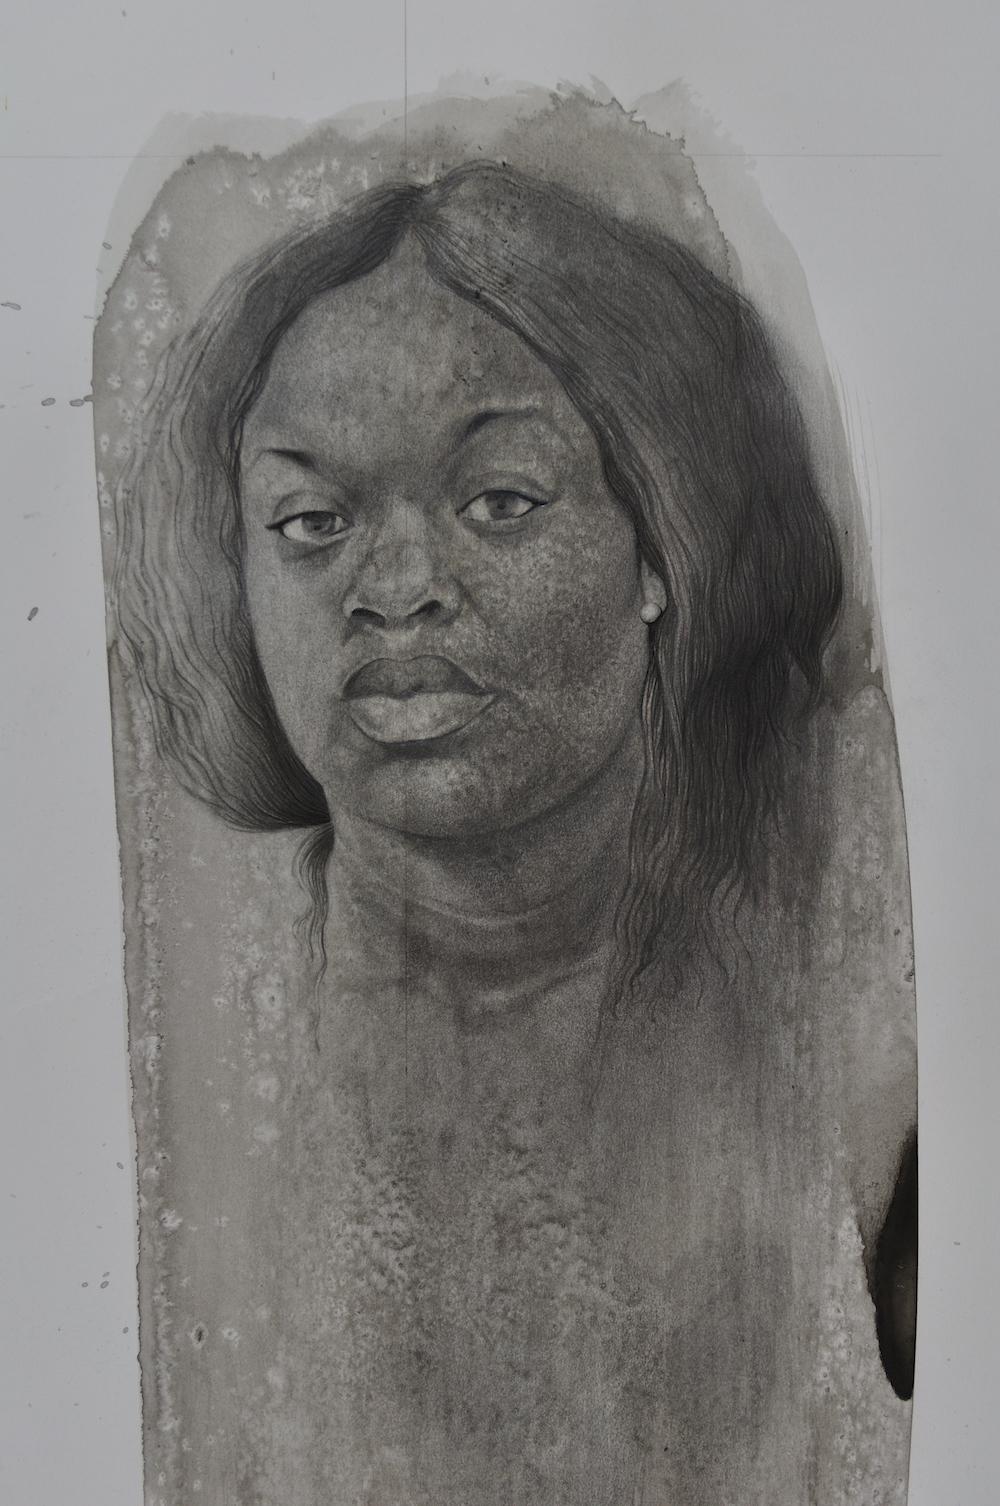 Latoya Capriola